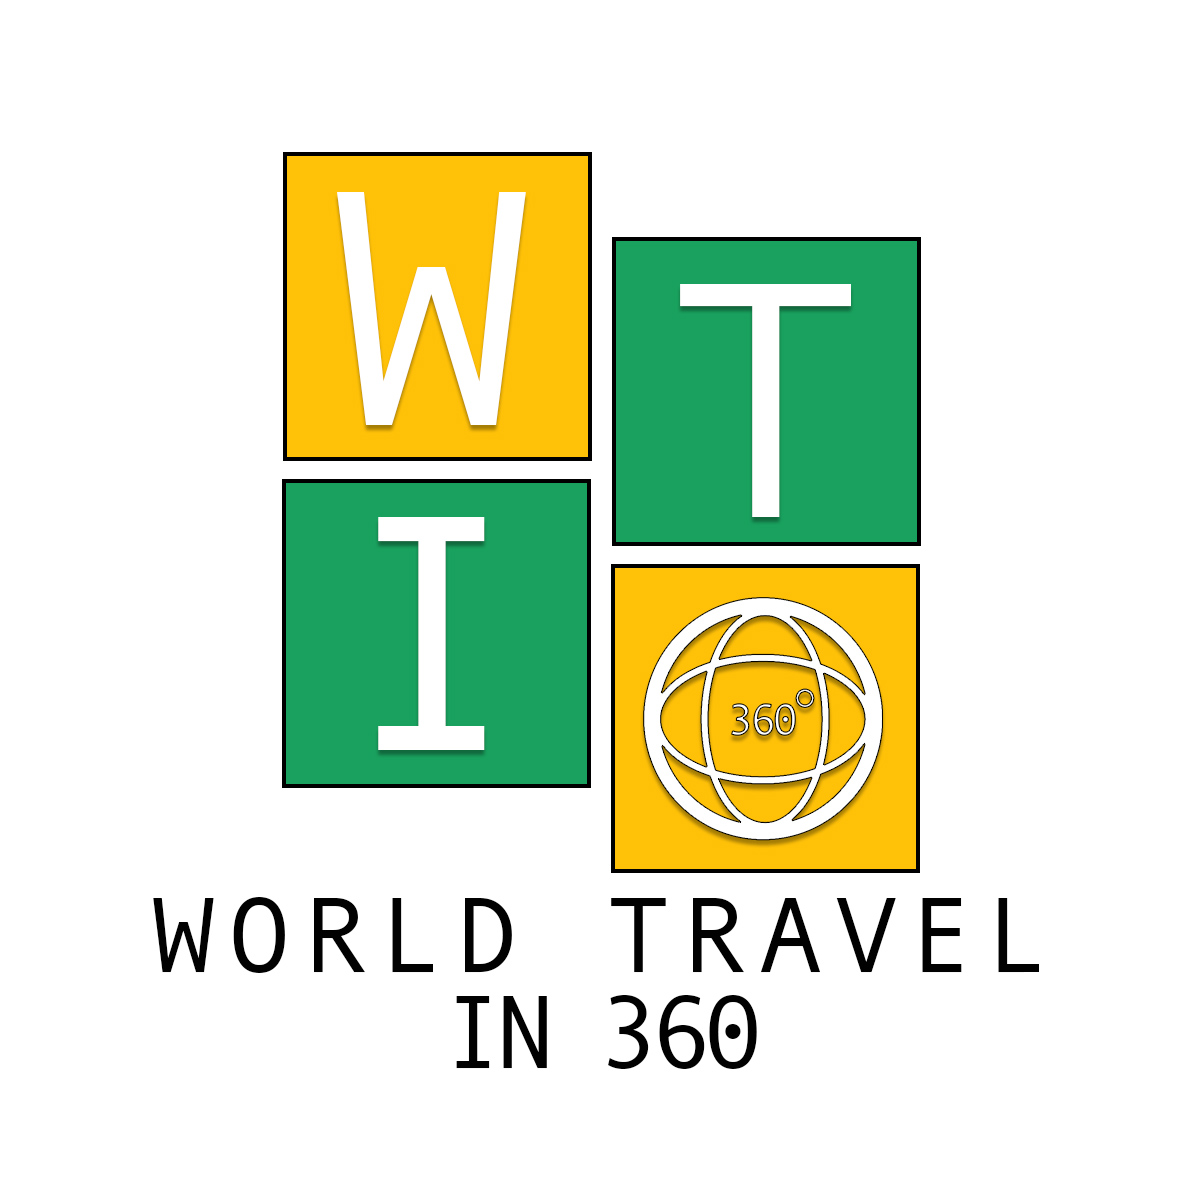 World Travel in 360, Zanzibar, Tanzania & Italy